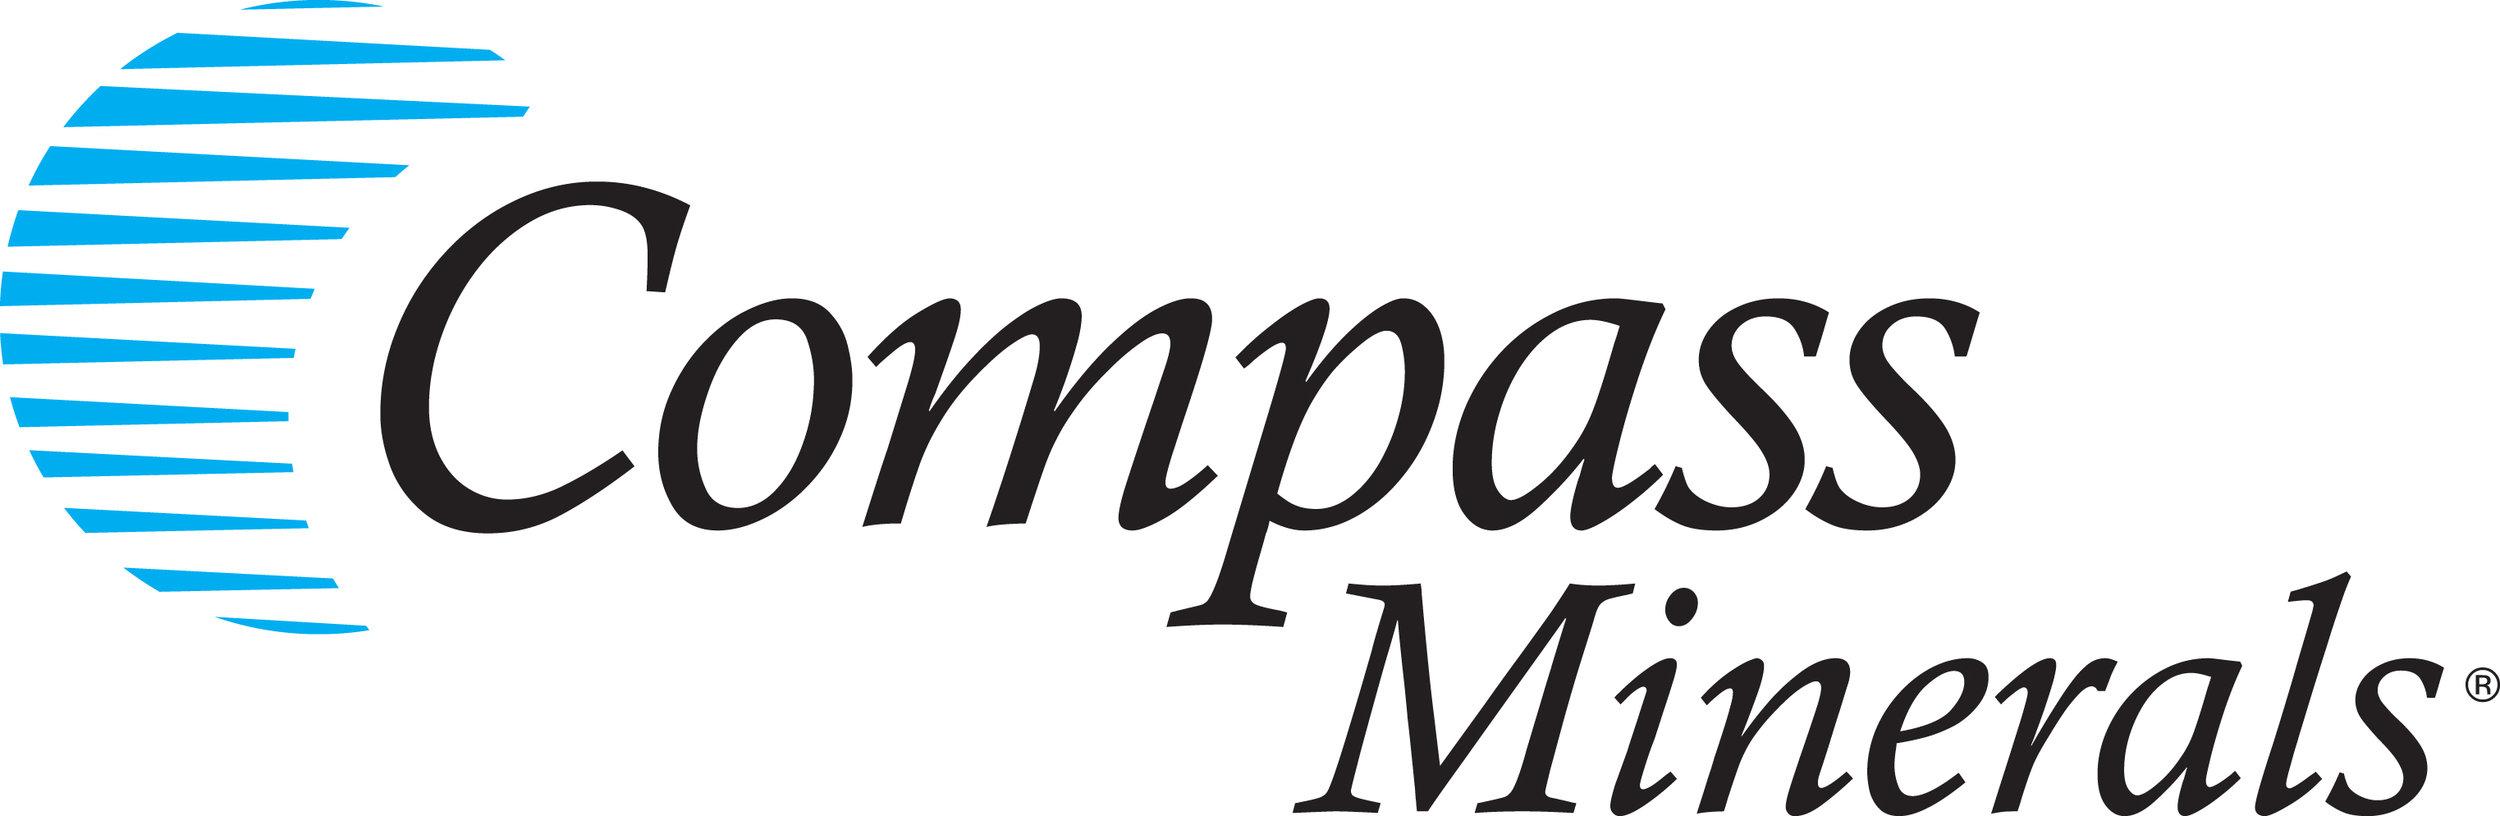 CompassLogoR_CyanBlack_highres.jpg